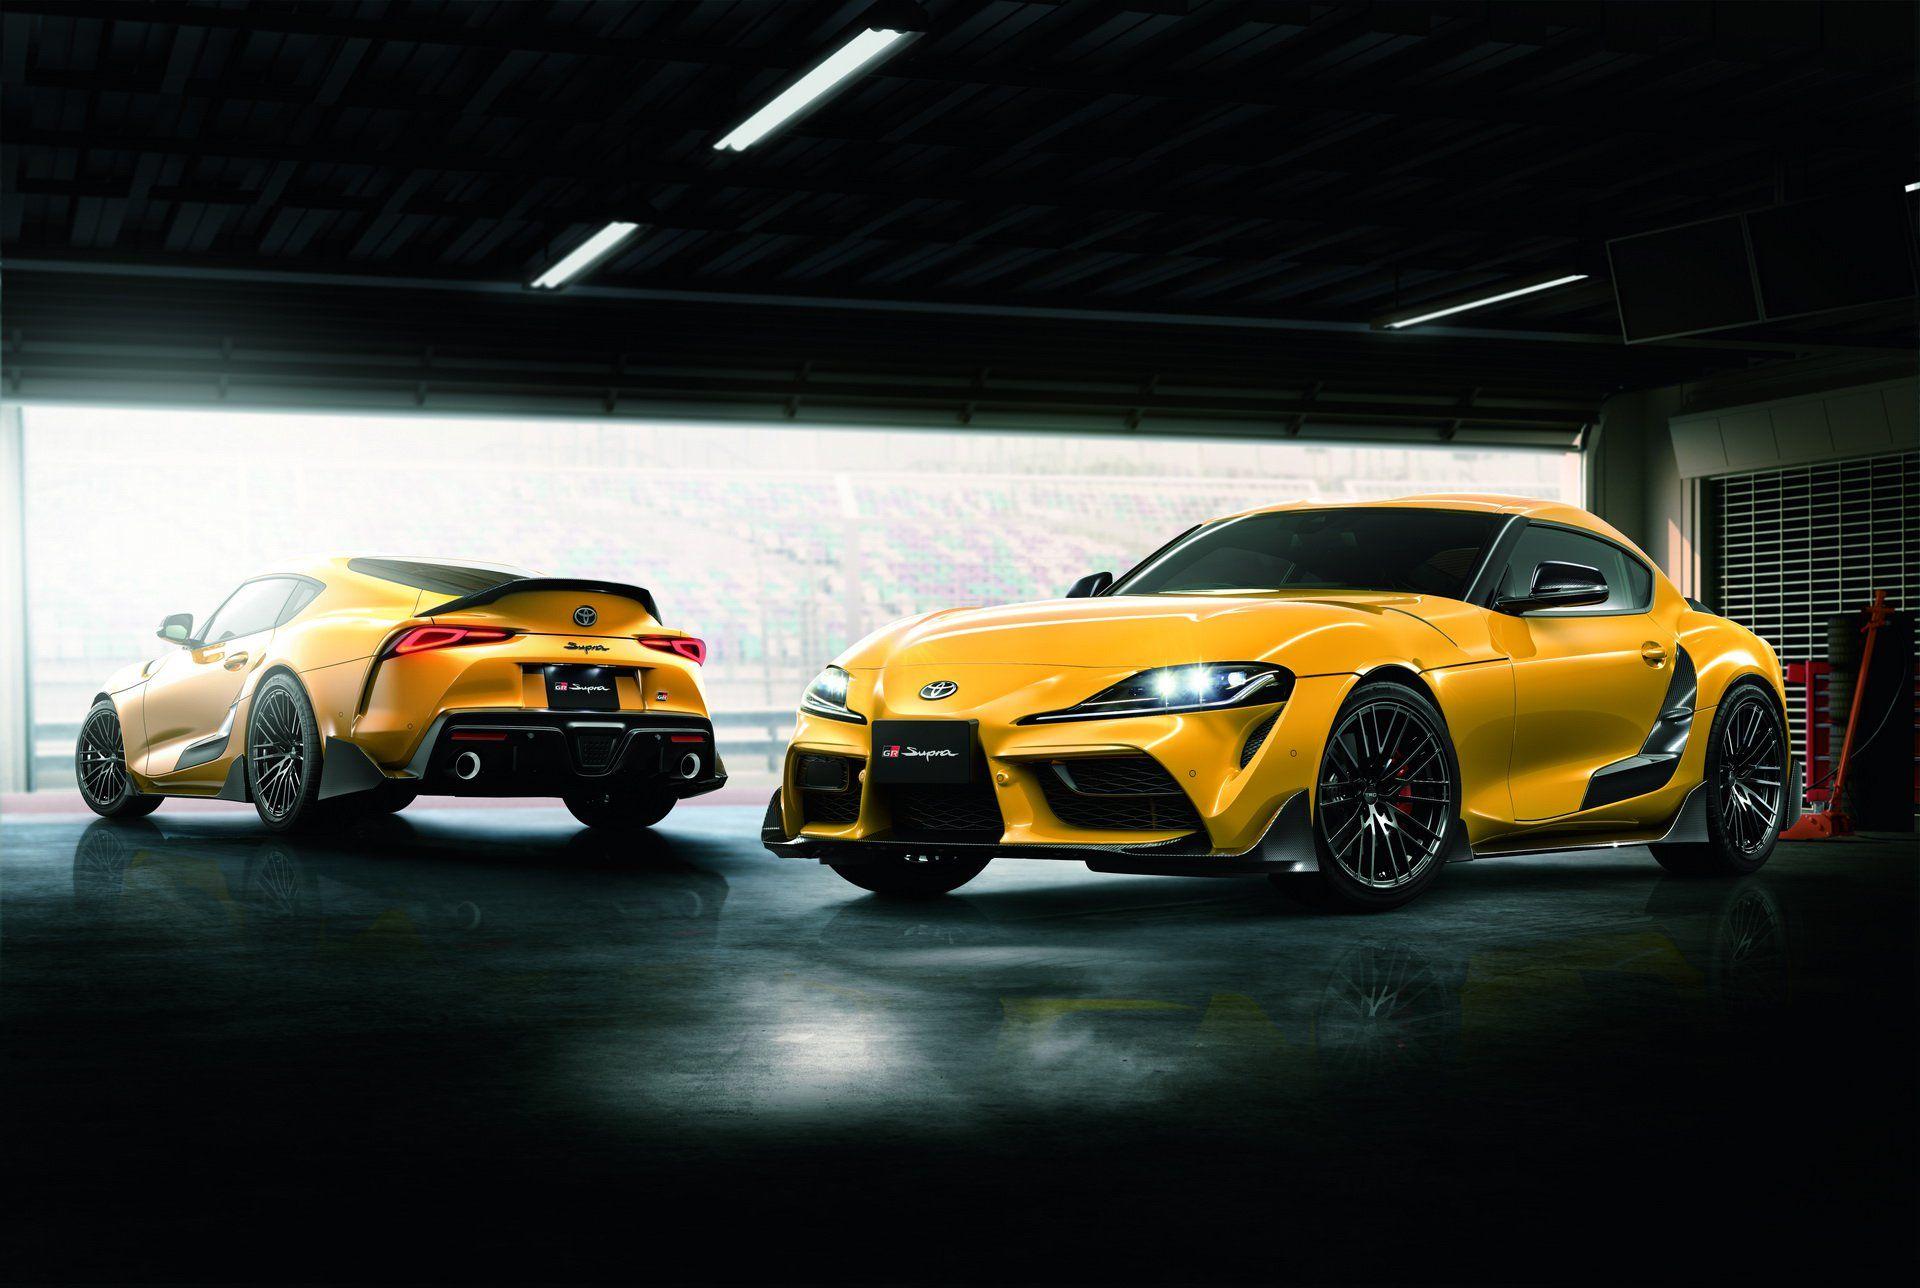 Toyota Gr Supra 2020 Toyota Supra New Toyota Supra Toyota